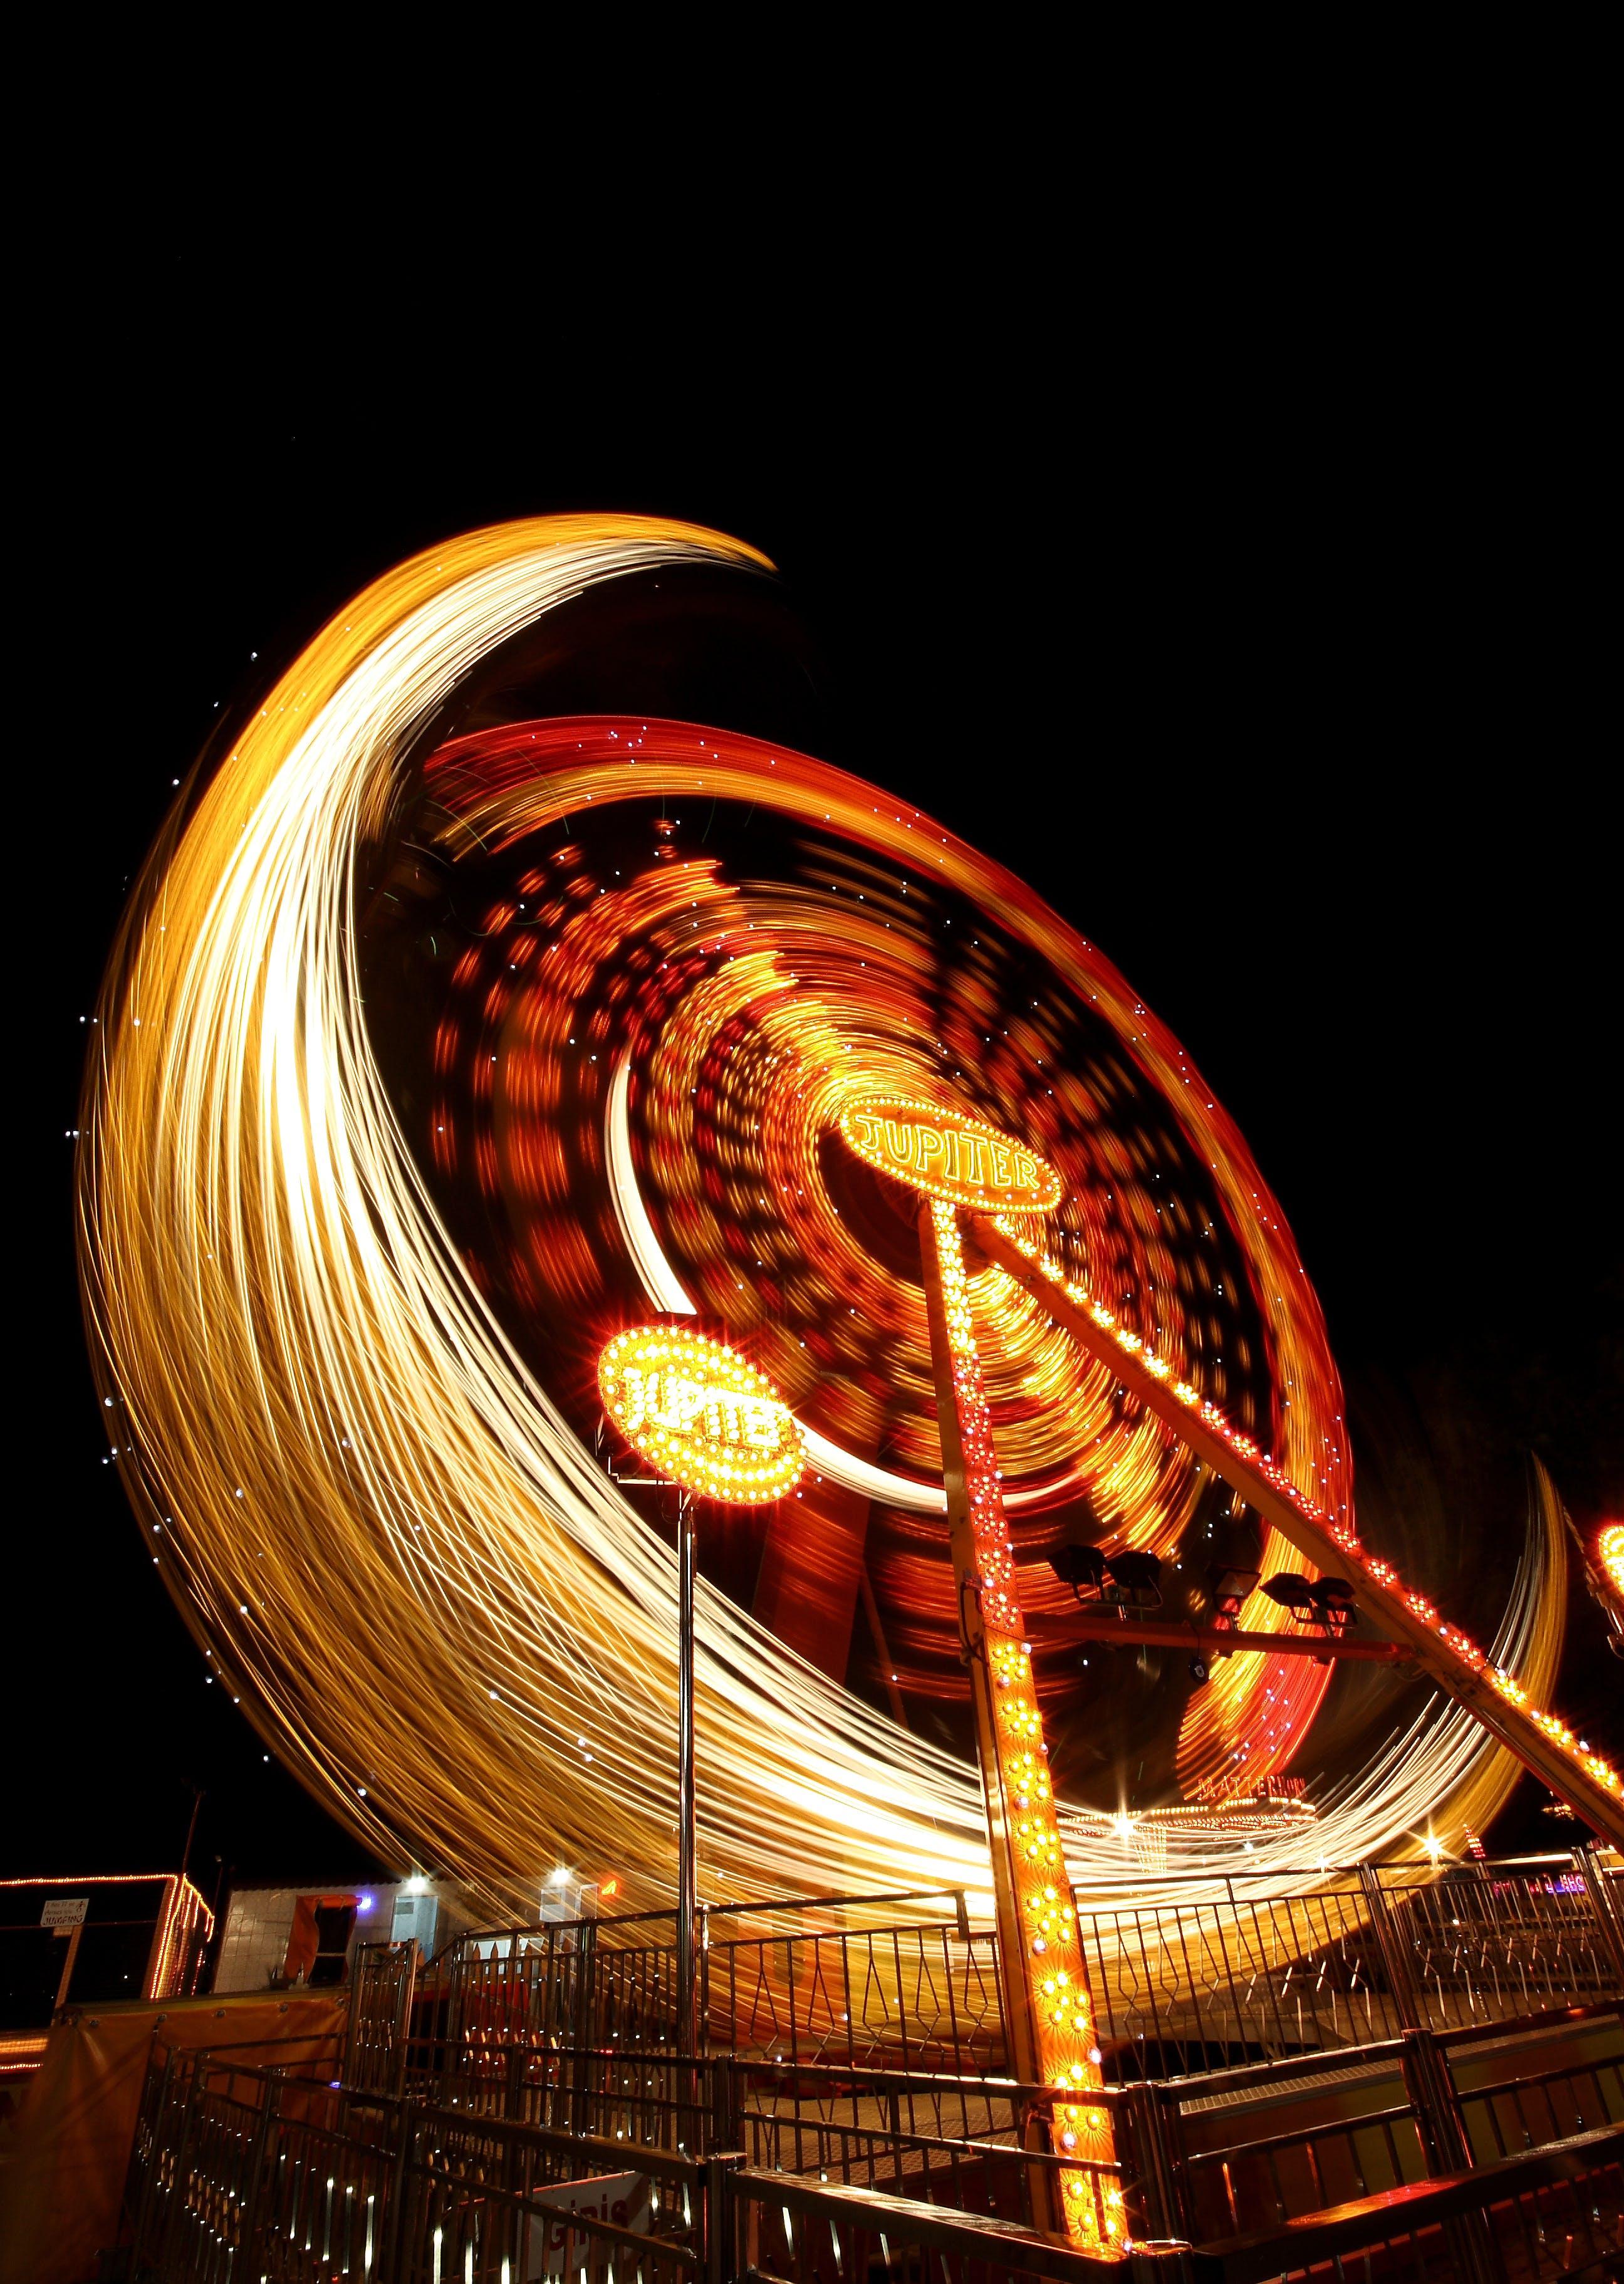 Steel Wool Amusement Park Ride